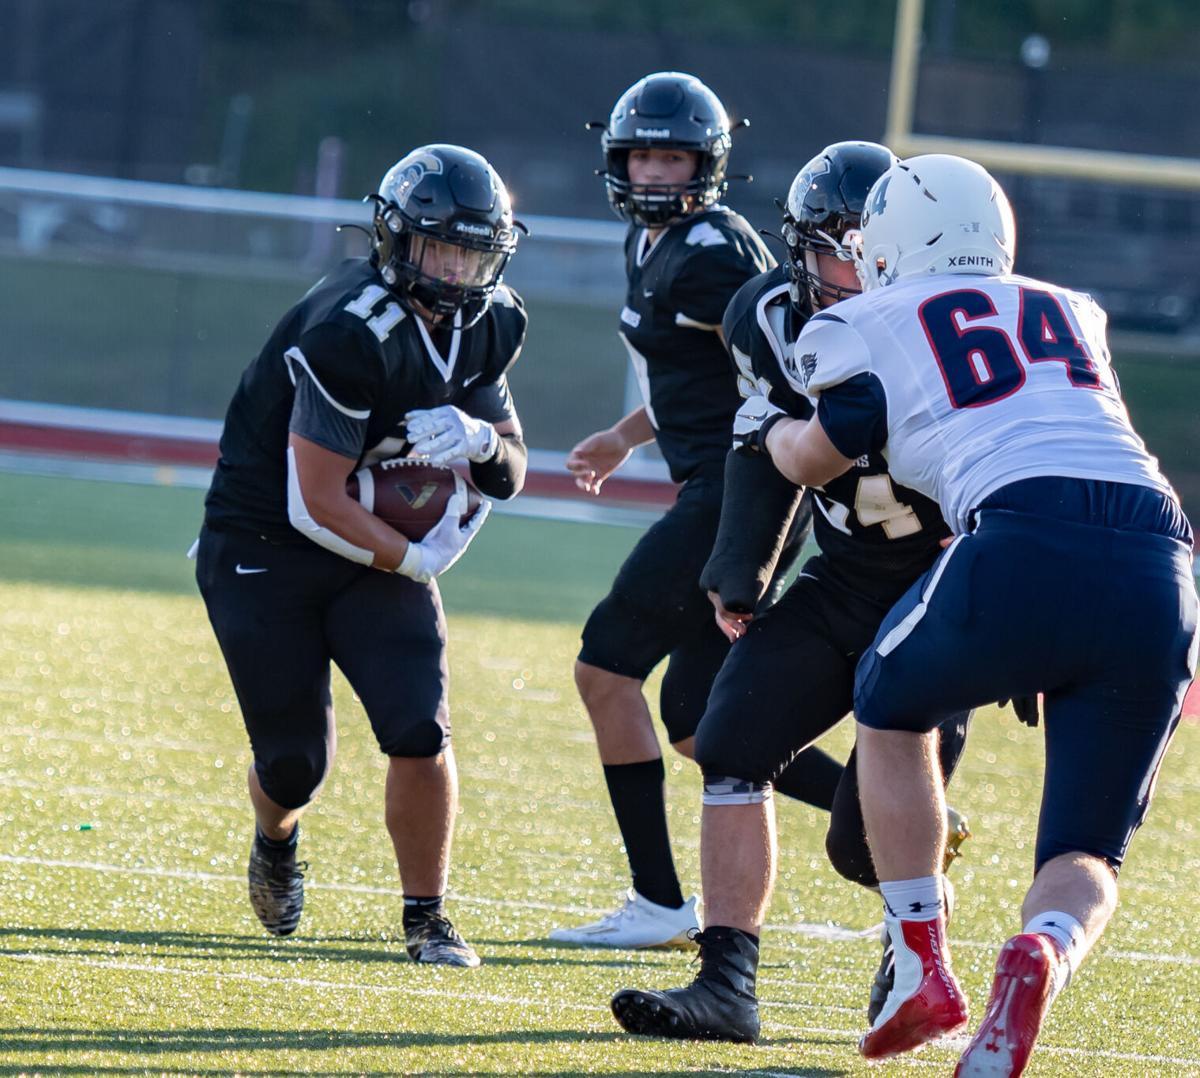 Monday night high school football action